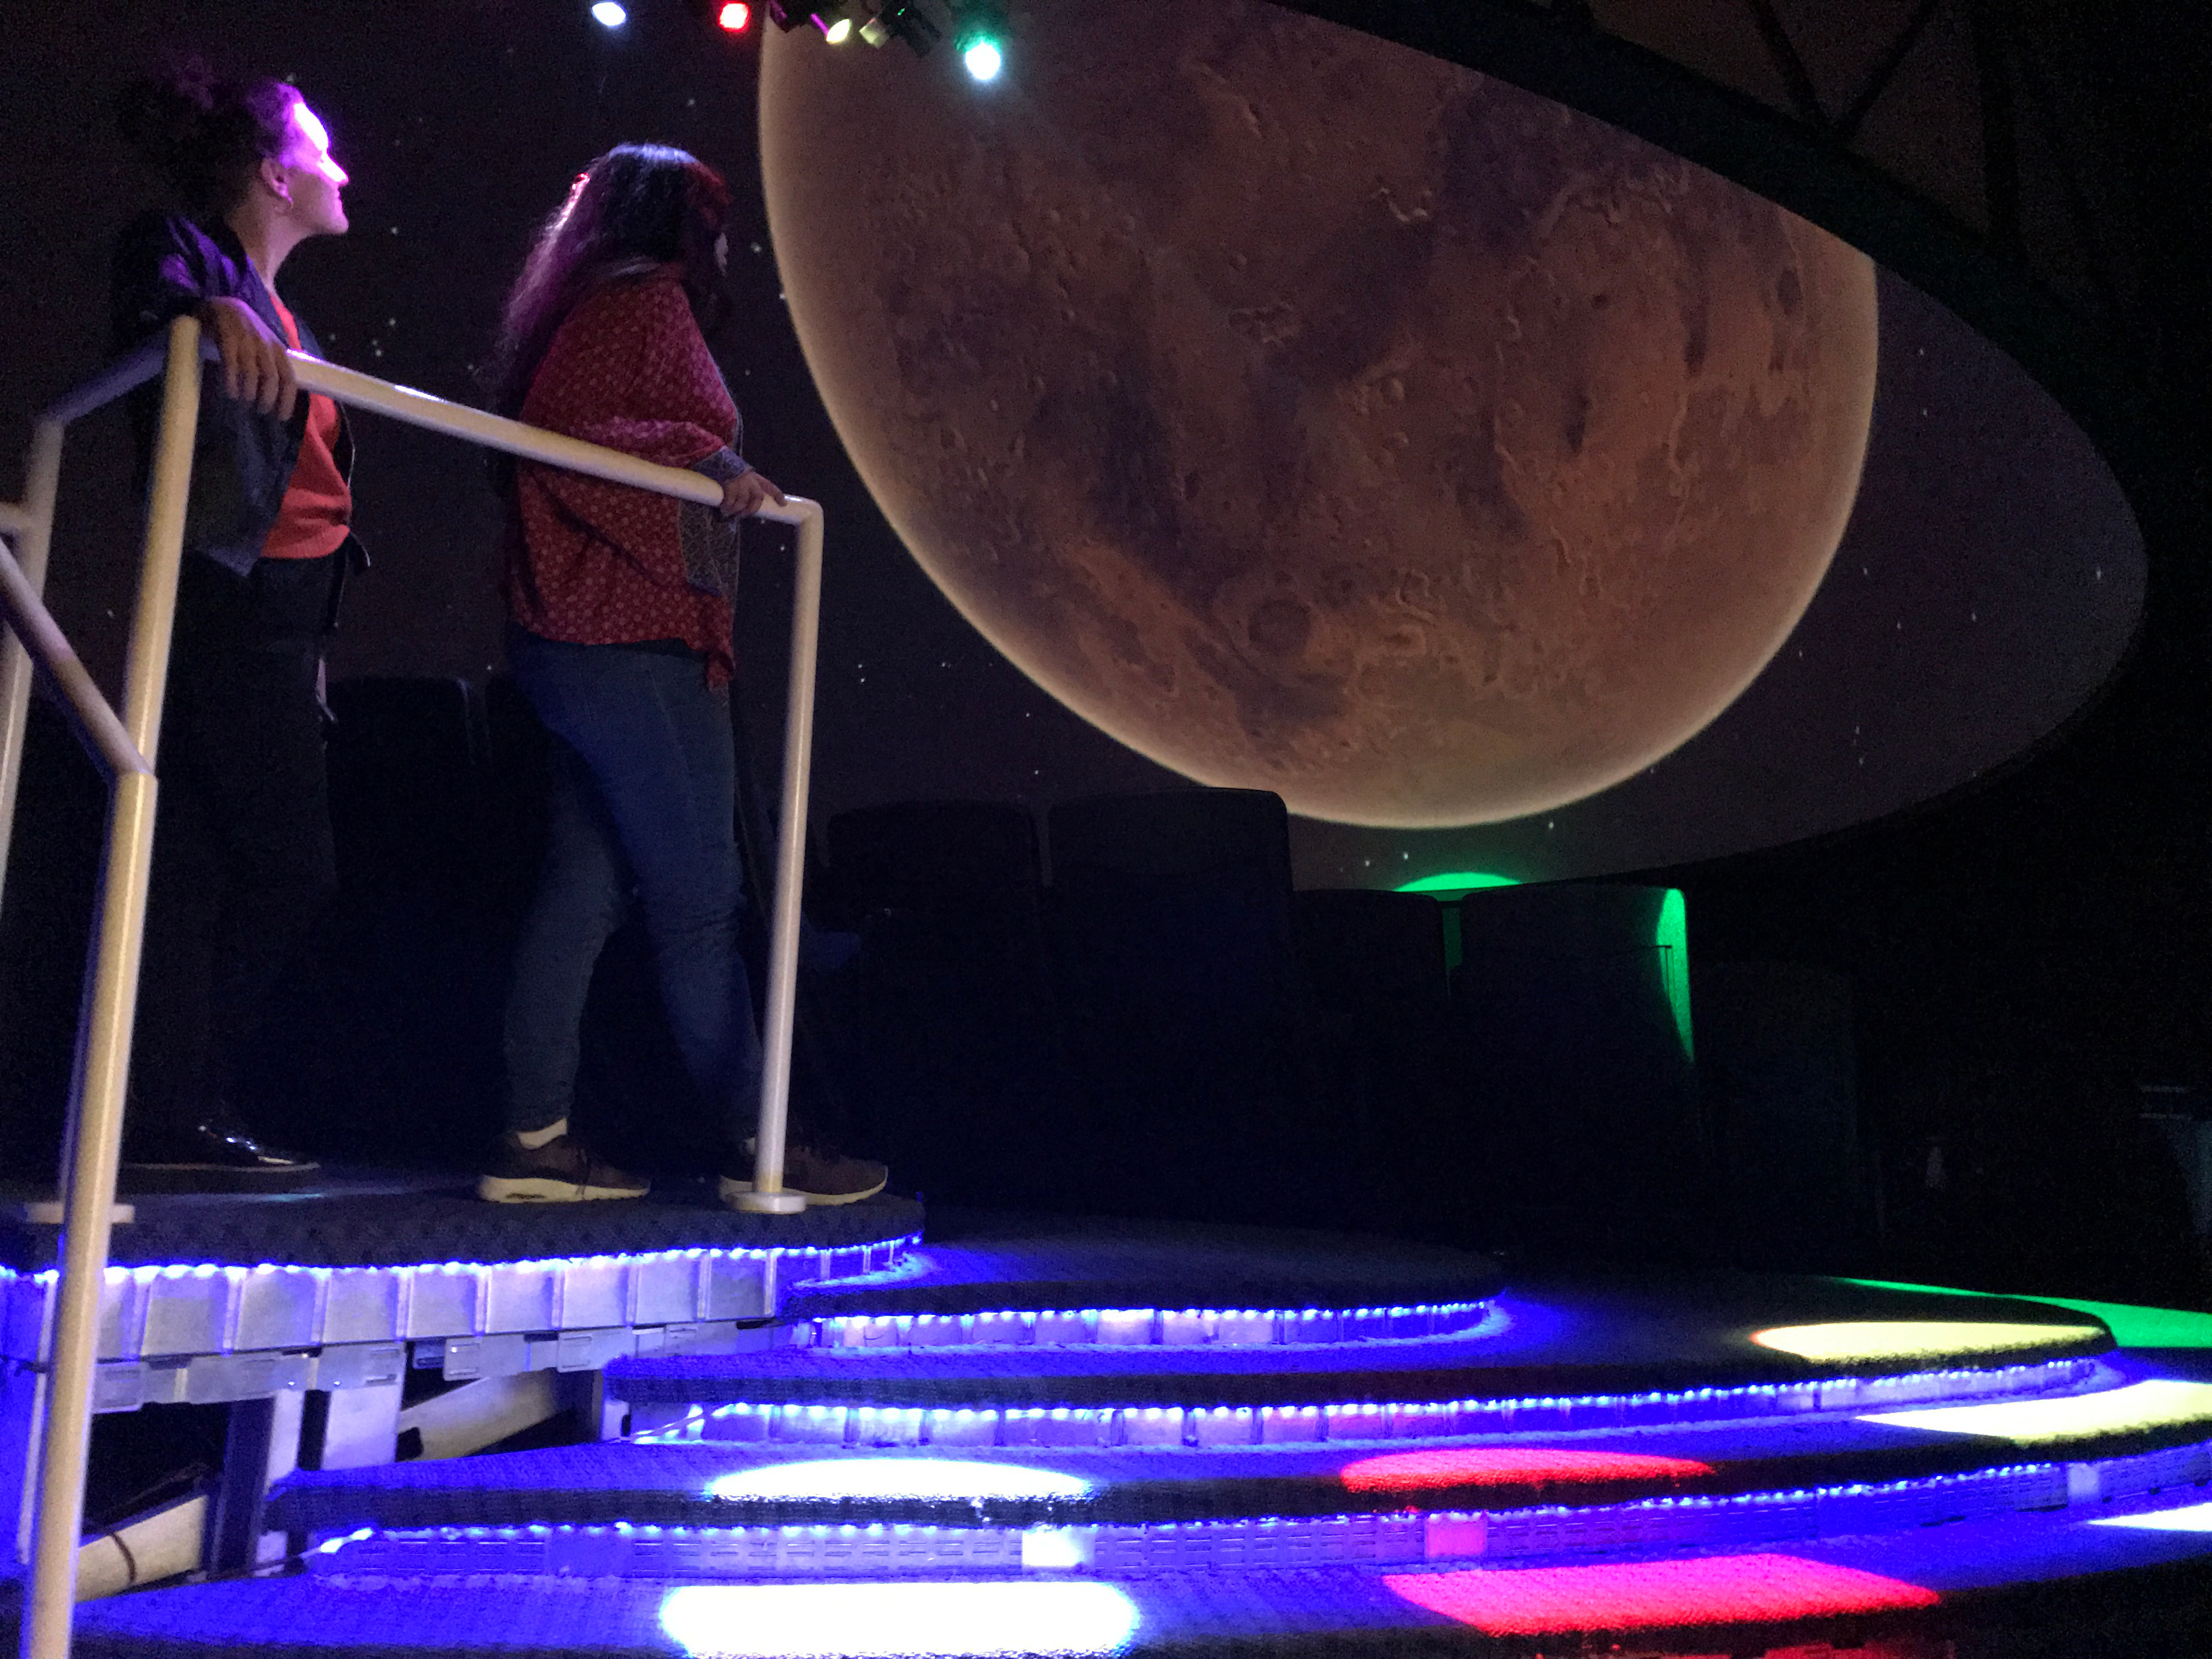 HiRISE | Made with HiRISE: East Village Planetarium